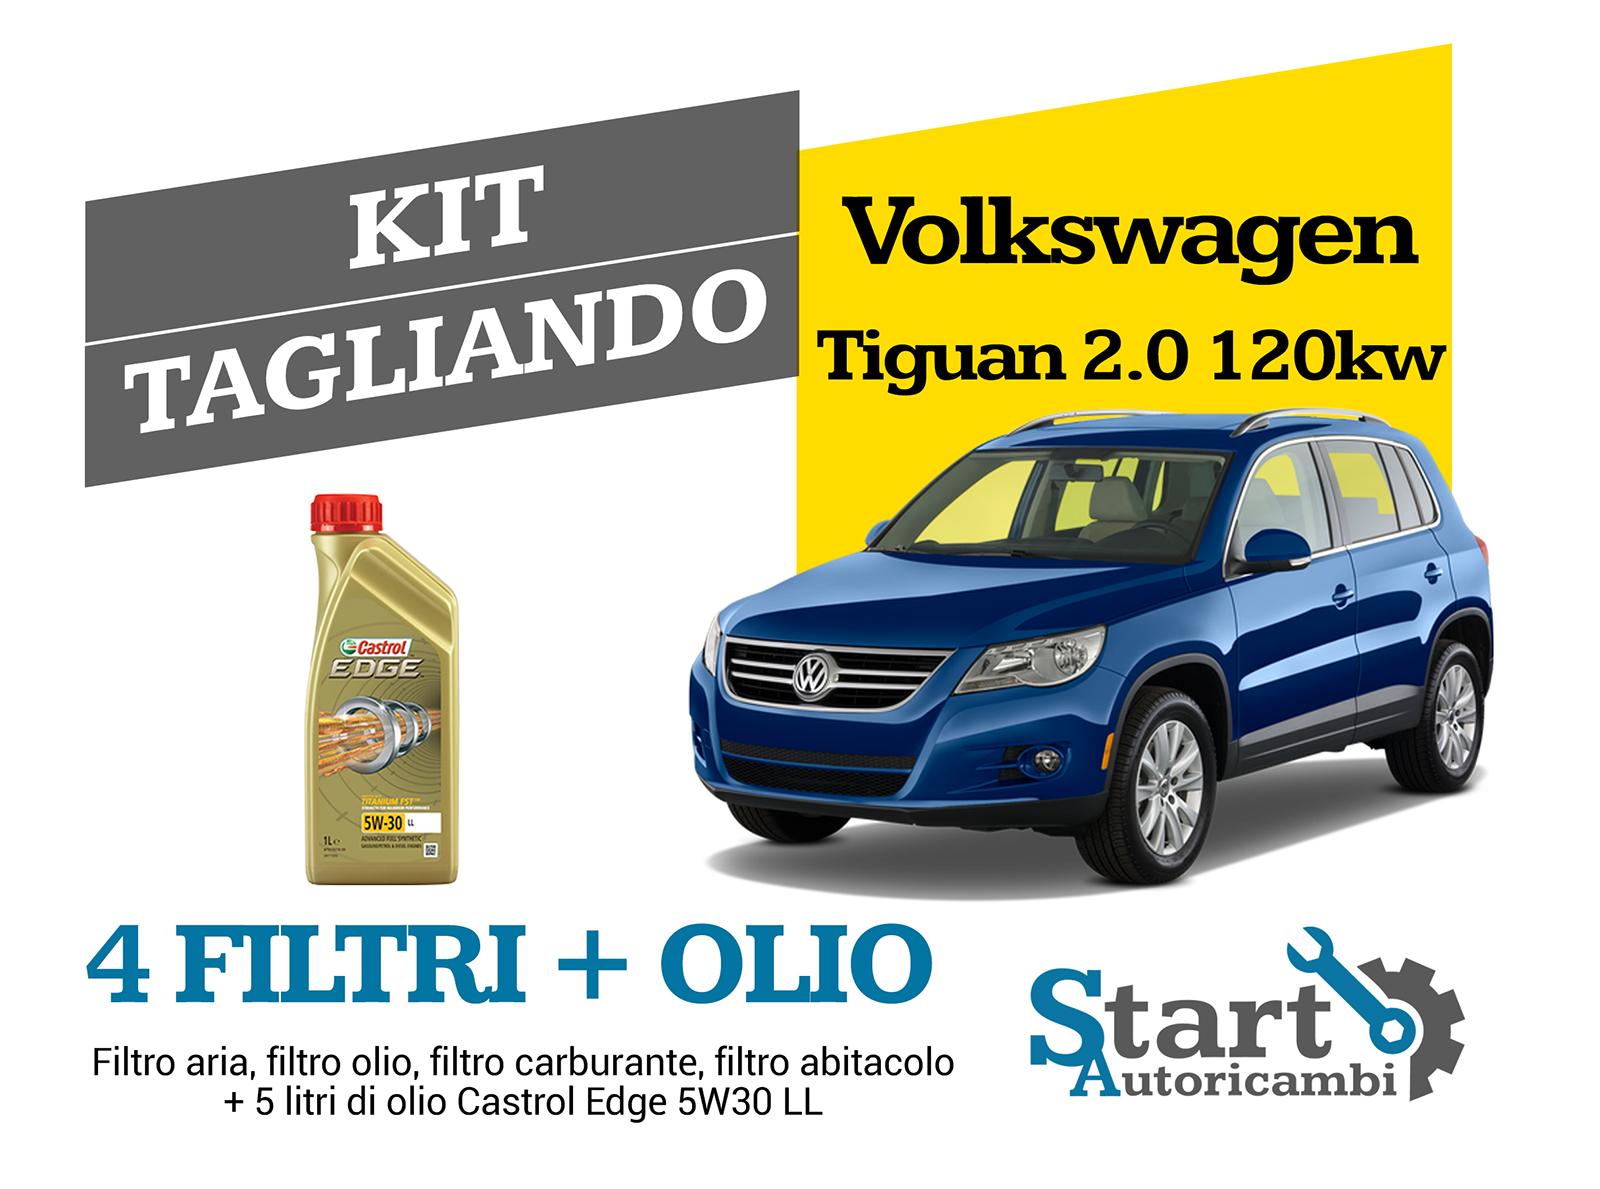 KIT TAGLIANDO 4 FILTRI VW TIGUAN 2.0 TDI 125KW 170CV DAL 2008 /> 2009